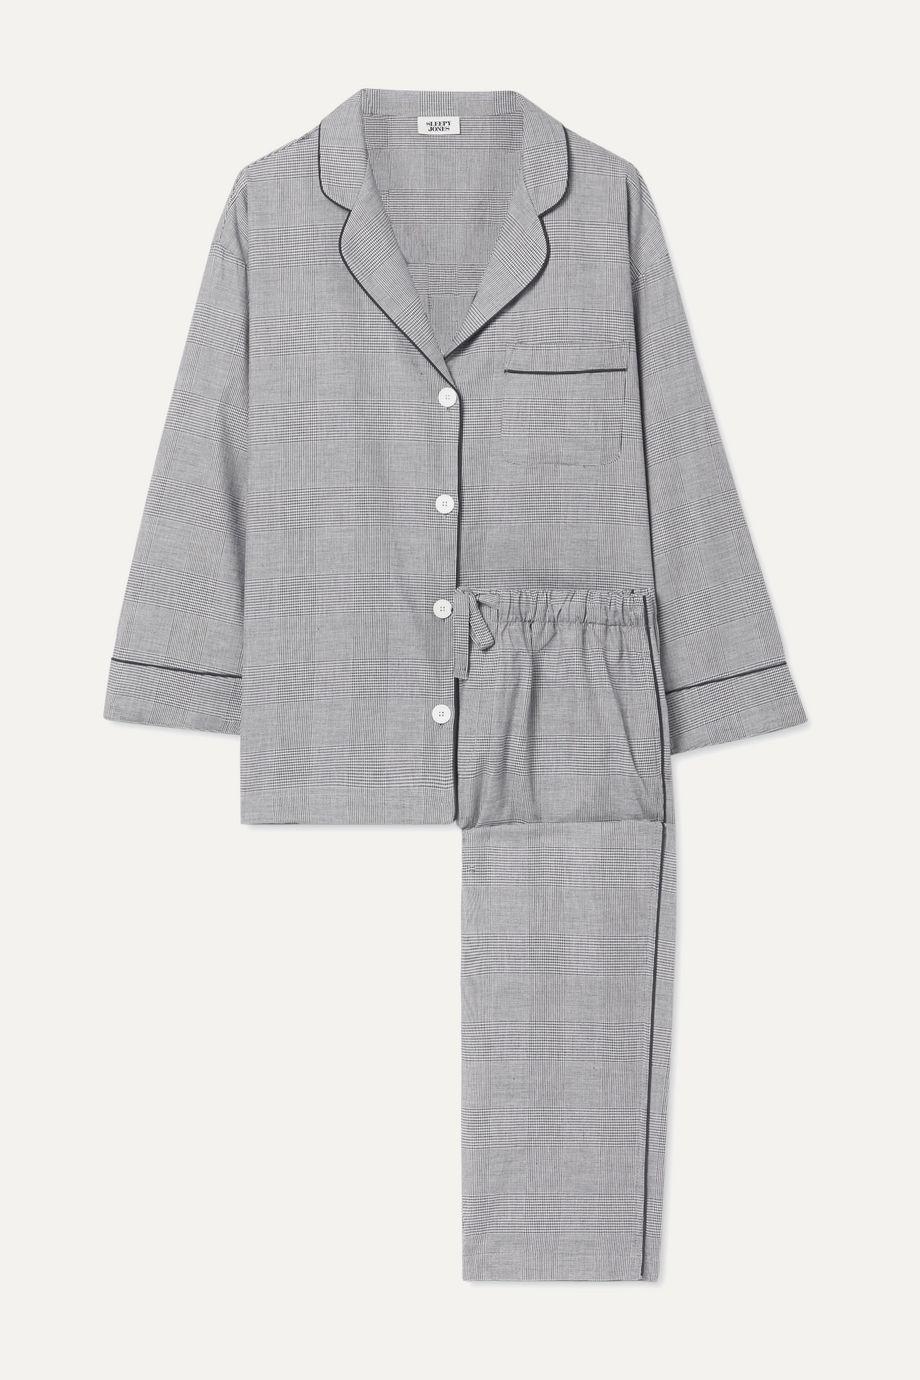 Sleepy Jones Marina Prince of Wales checked cotton pajama set